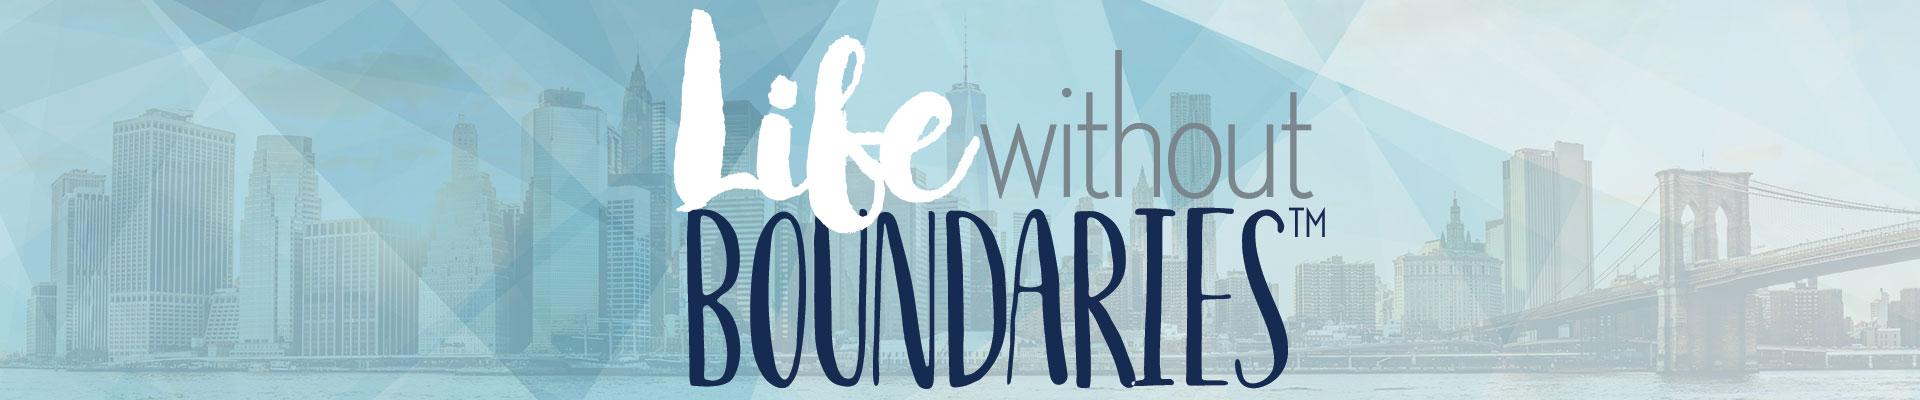 LifeBound_Compass_080217_City